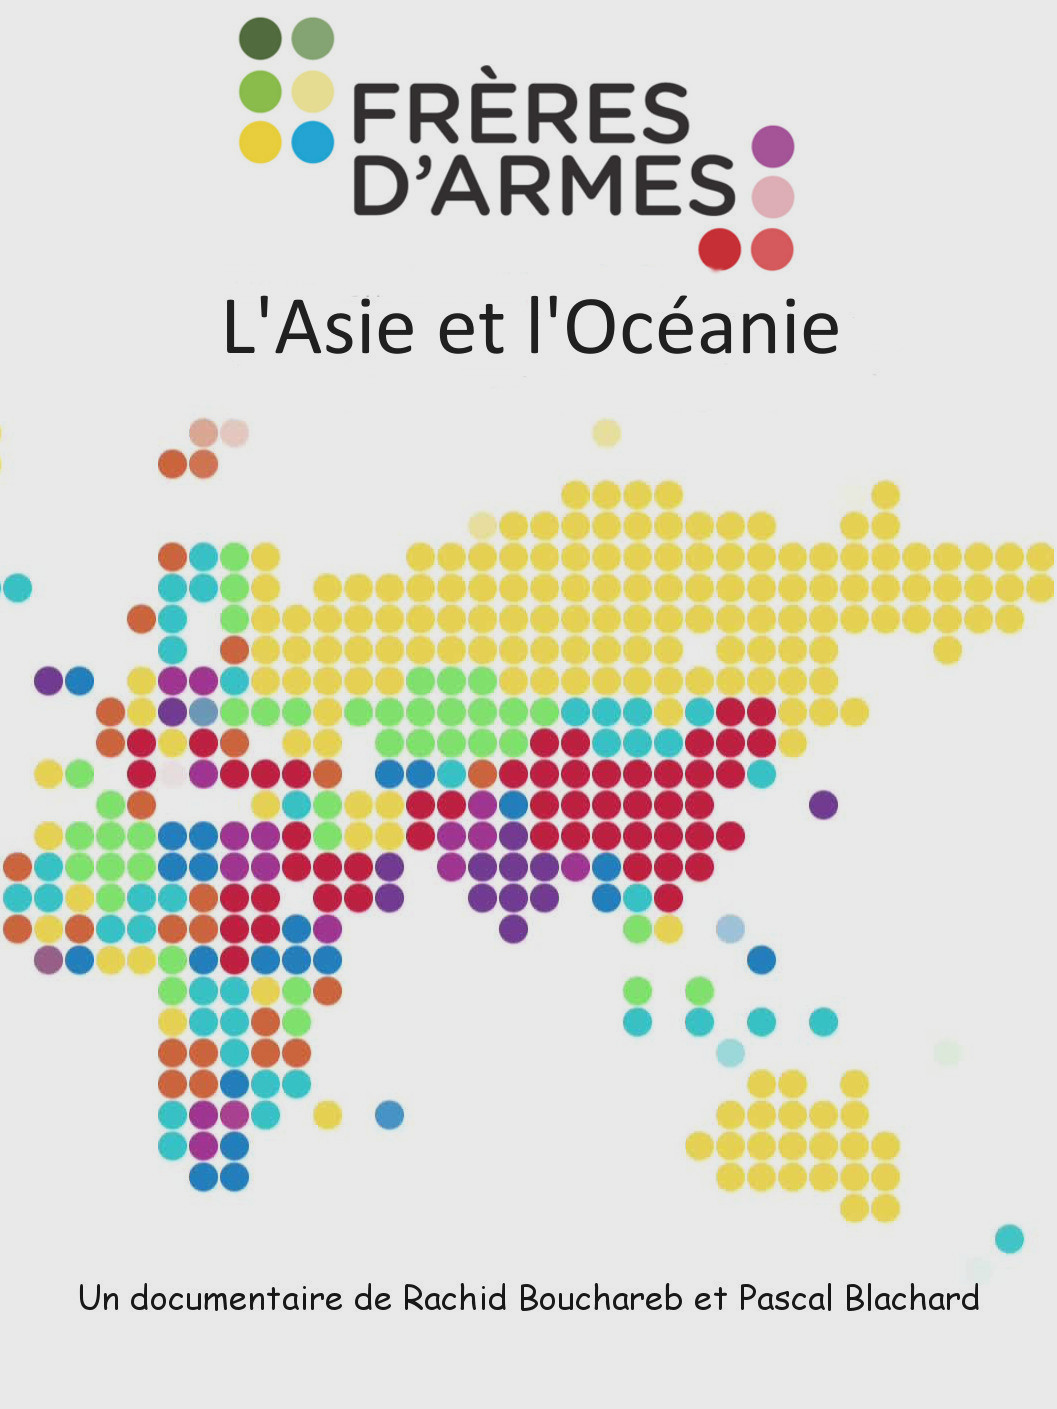 Frères d'armes : Asie et Océanie